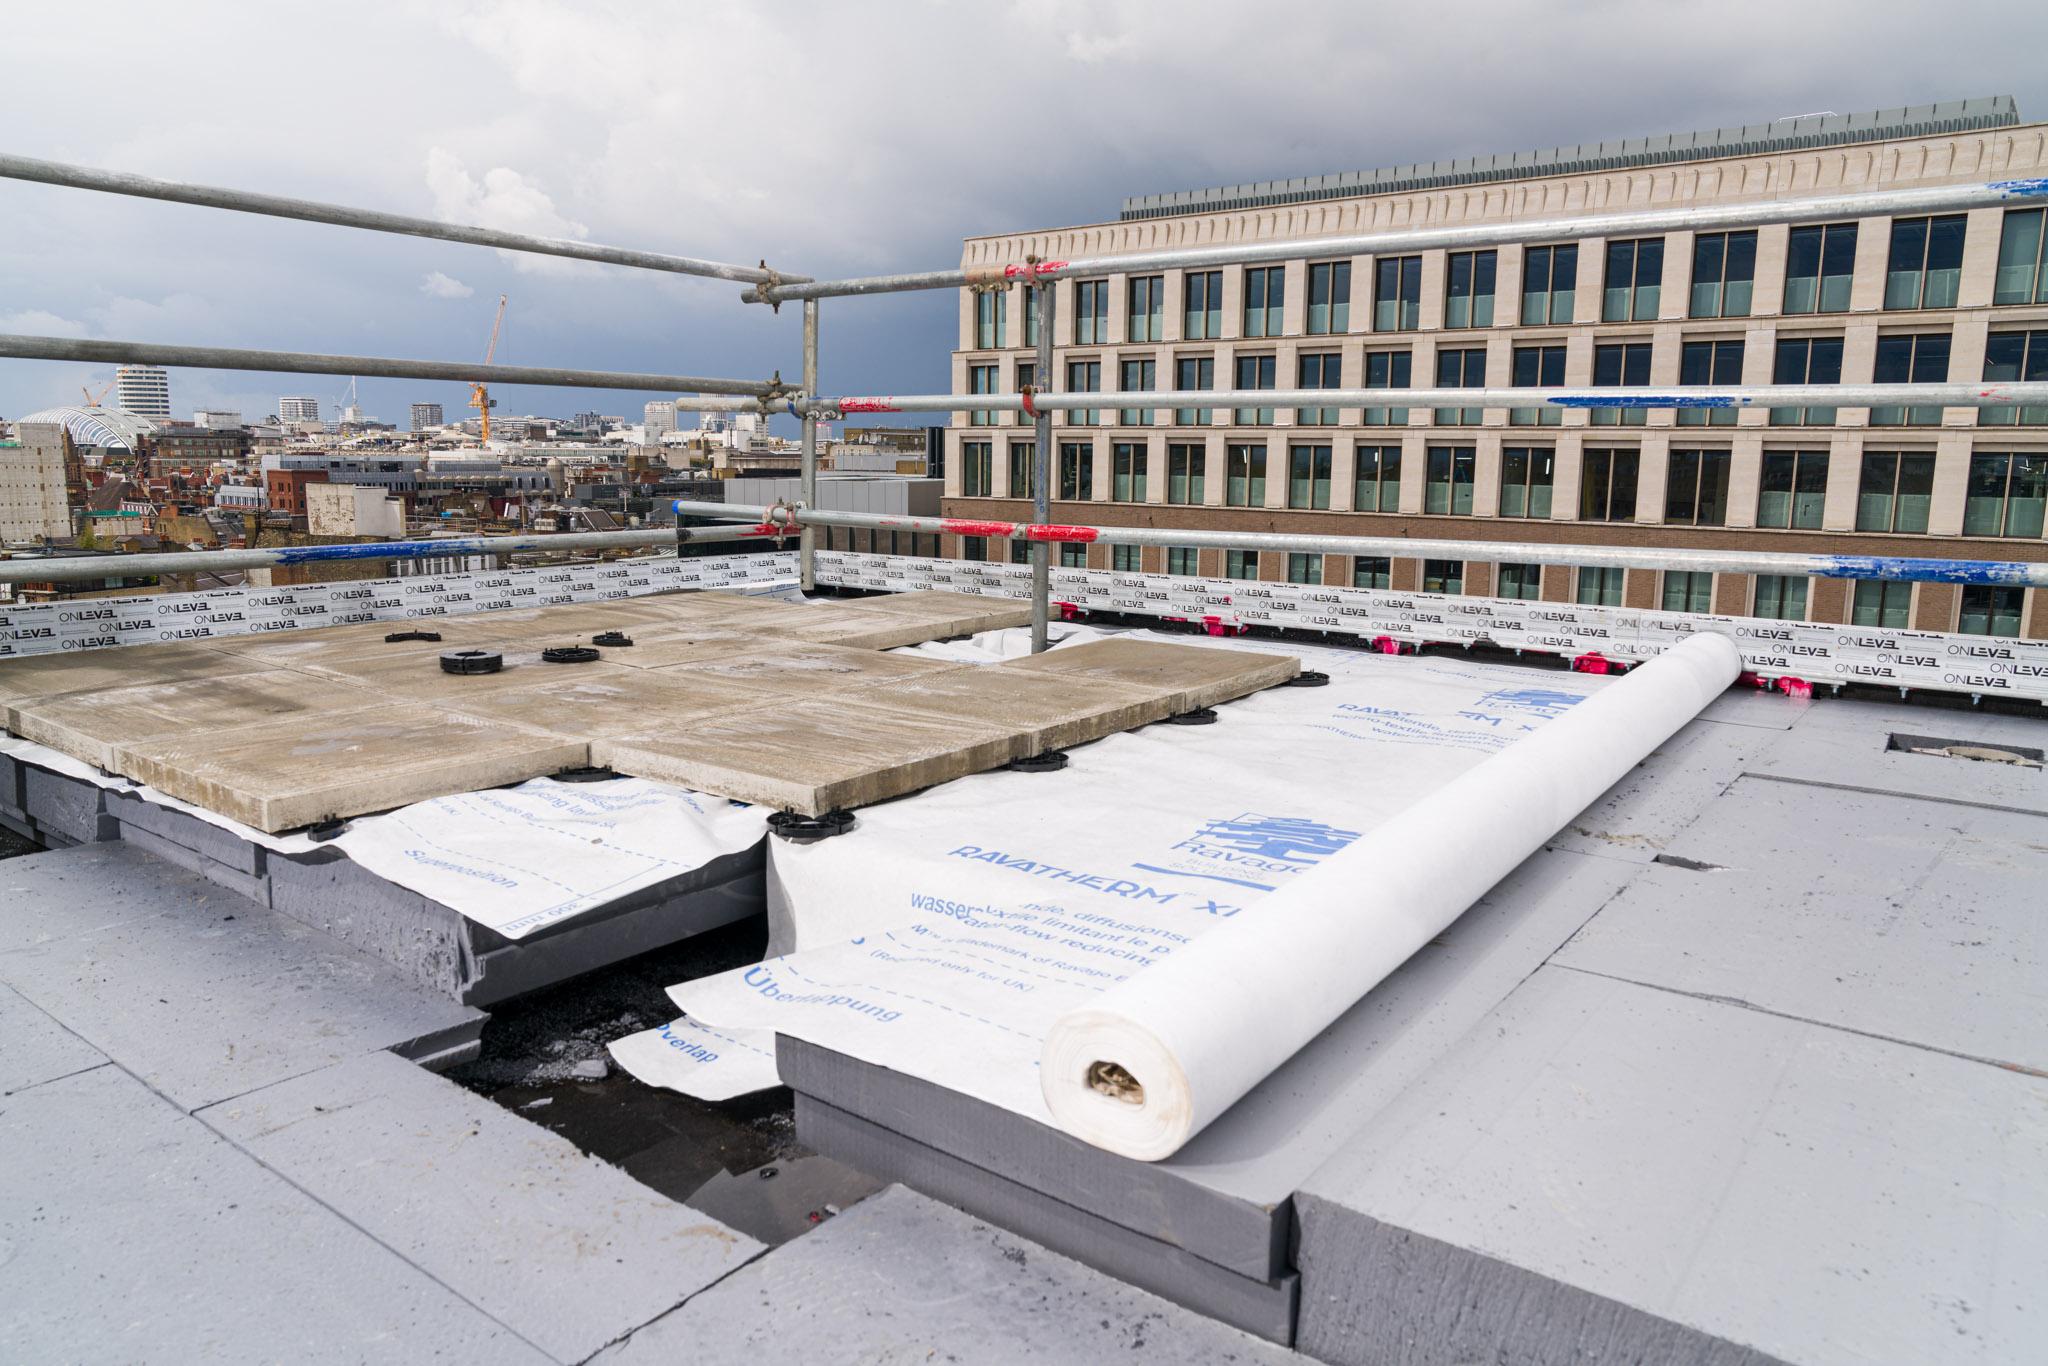 Ravatherm XPS X ULTRA 300 SL specified for £50 million Mayfair development